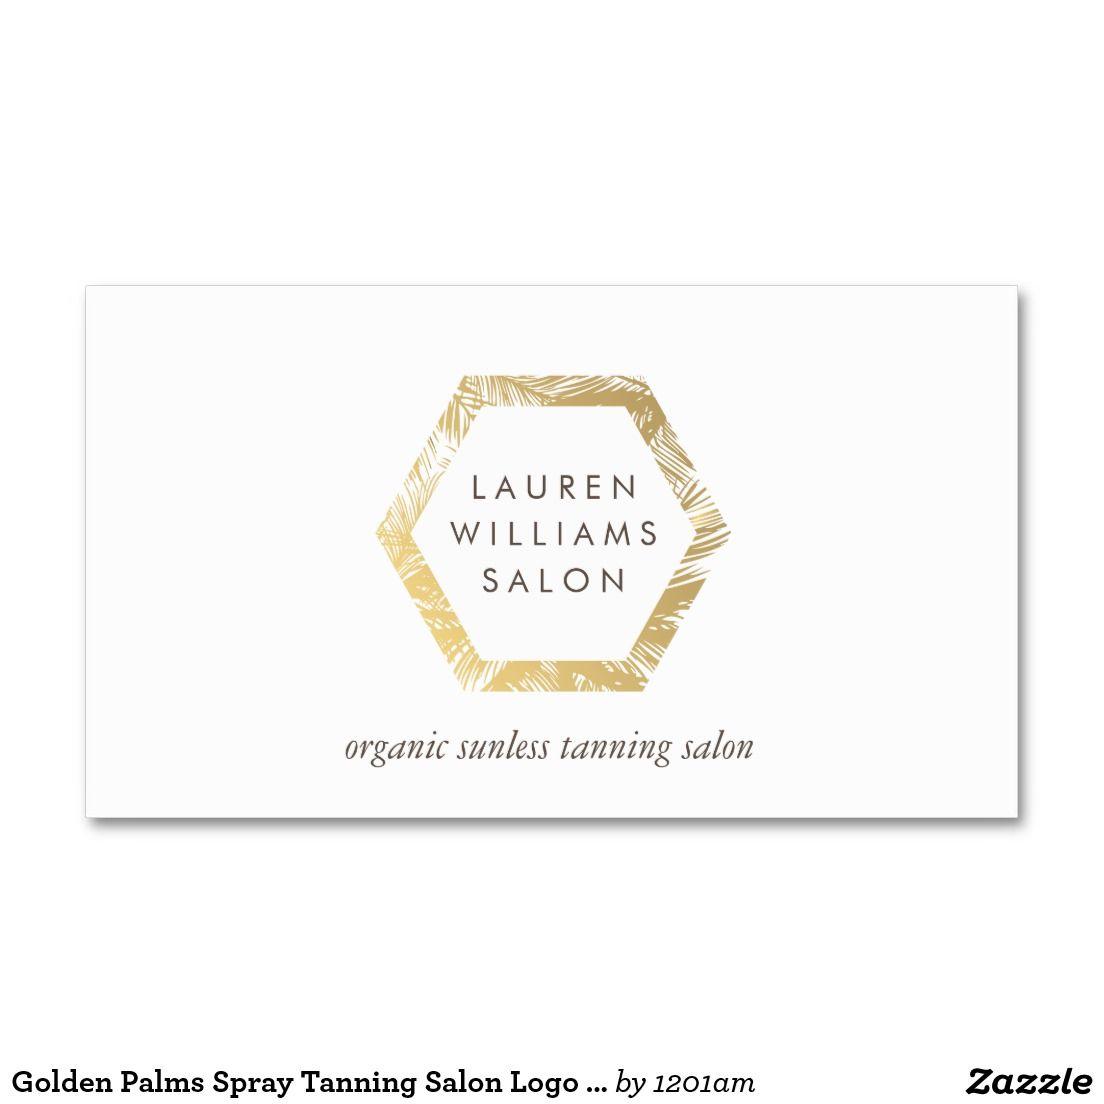 Golden Palms Spray Tanning Salon Logo on White Business Card | Salon ...